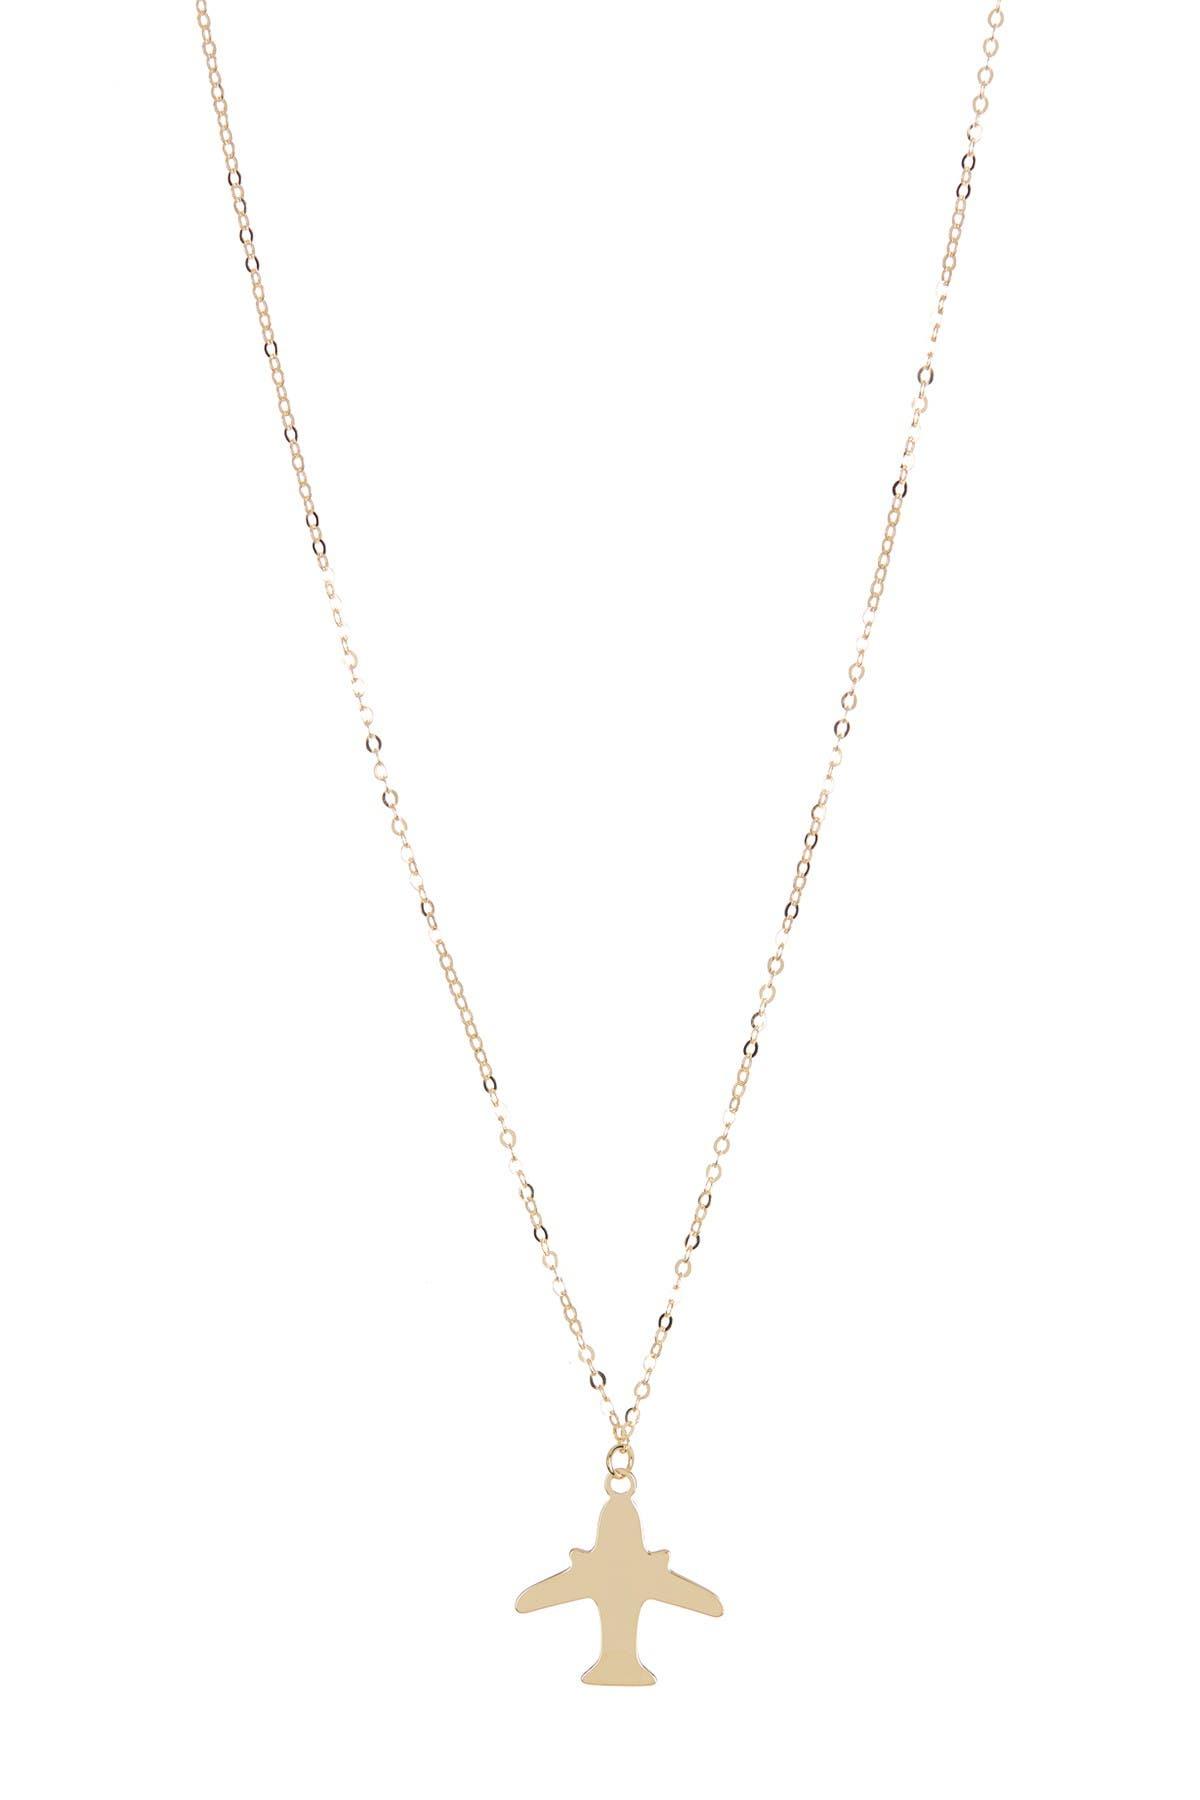 Image of KARAT RUSH 14K Yellow Gold Airplane Pendant Necklace